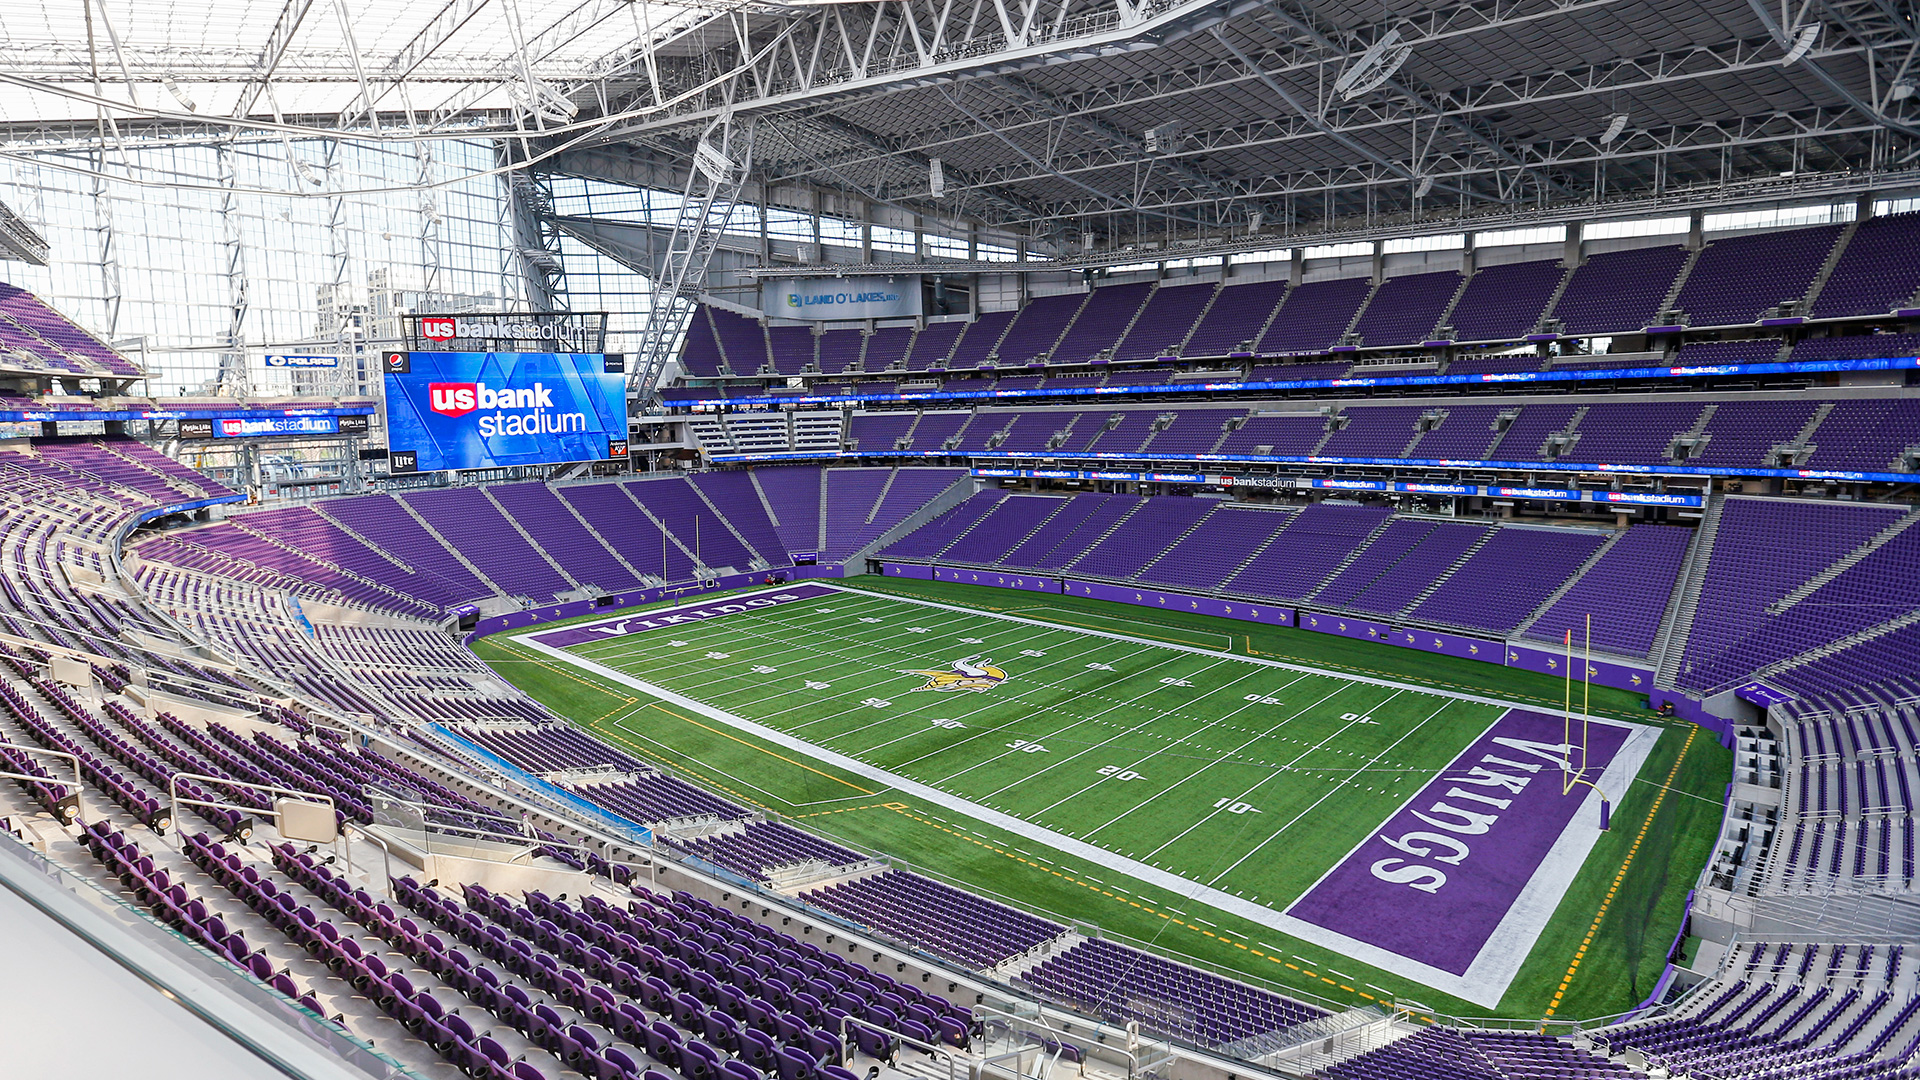 Vikings-stadium-072116-ap-ftrjpg_y62vxsm5cpcu1by7zacboodho